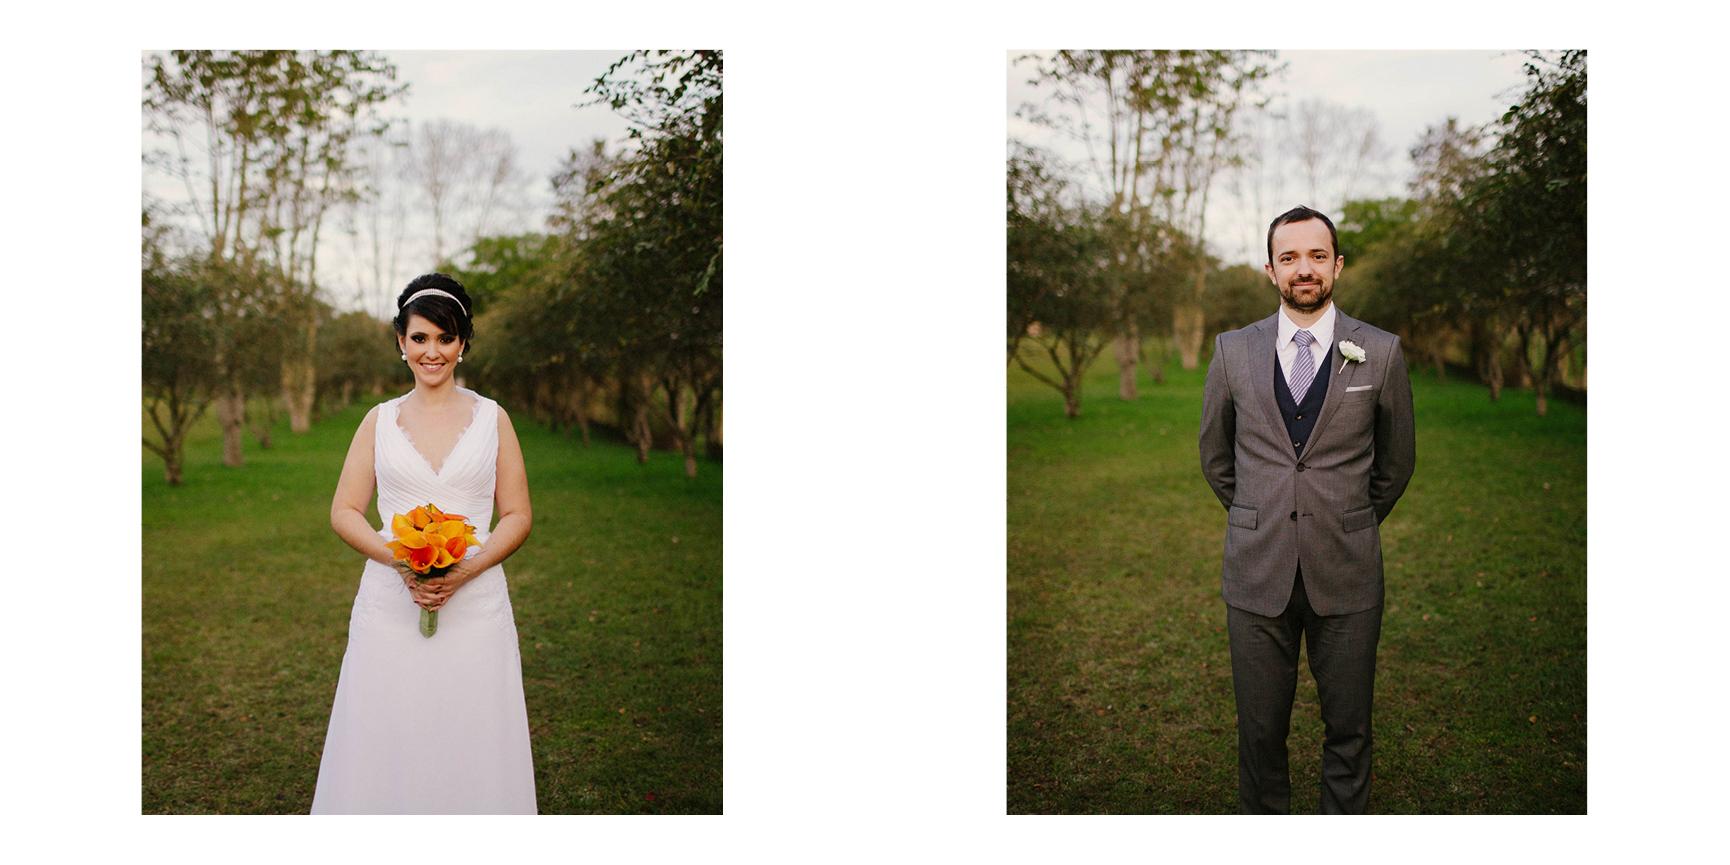 mariana-alves-fotografia-casamento-curitiba-willian-tais (256)